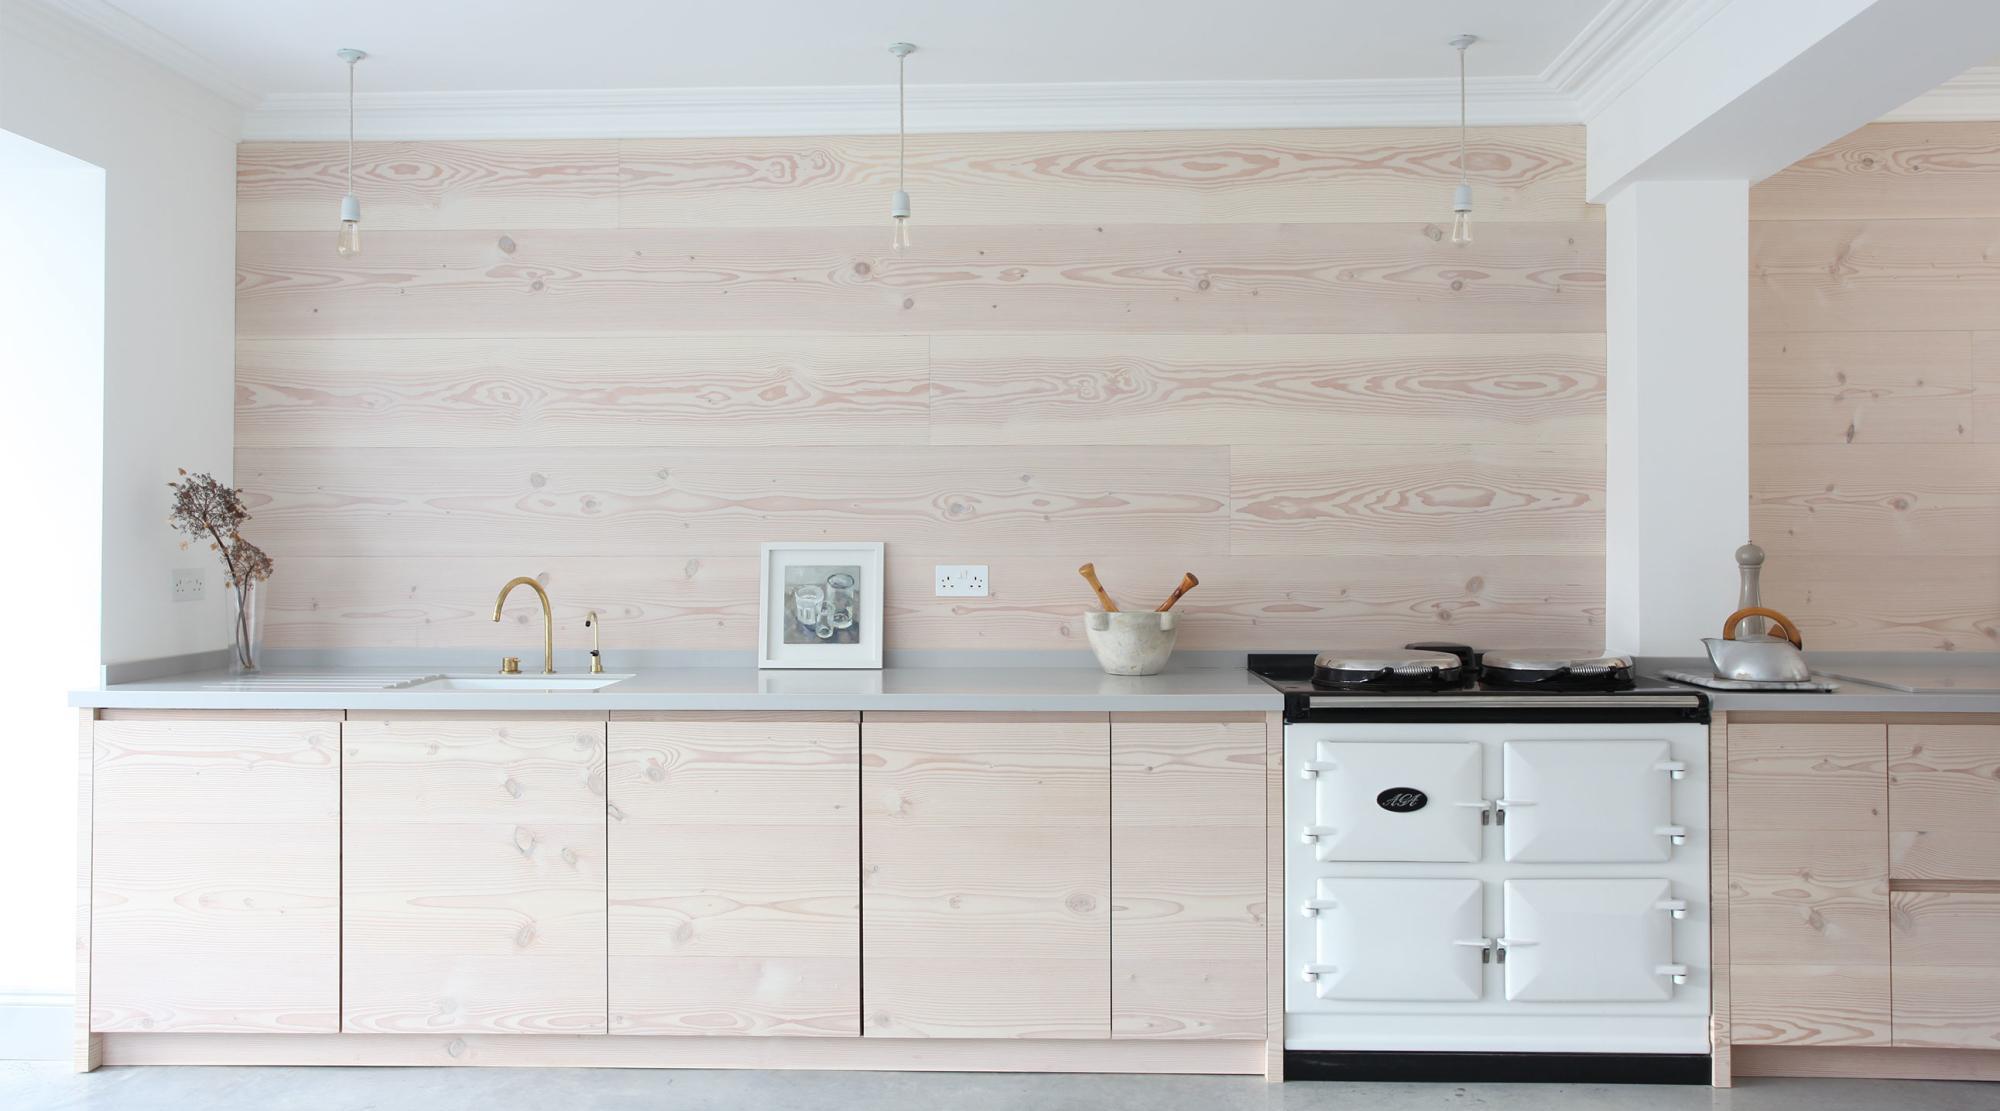 Дизайн кухни скандинавской 2017